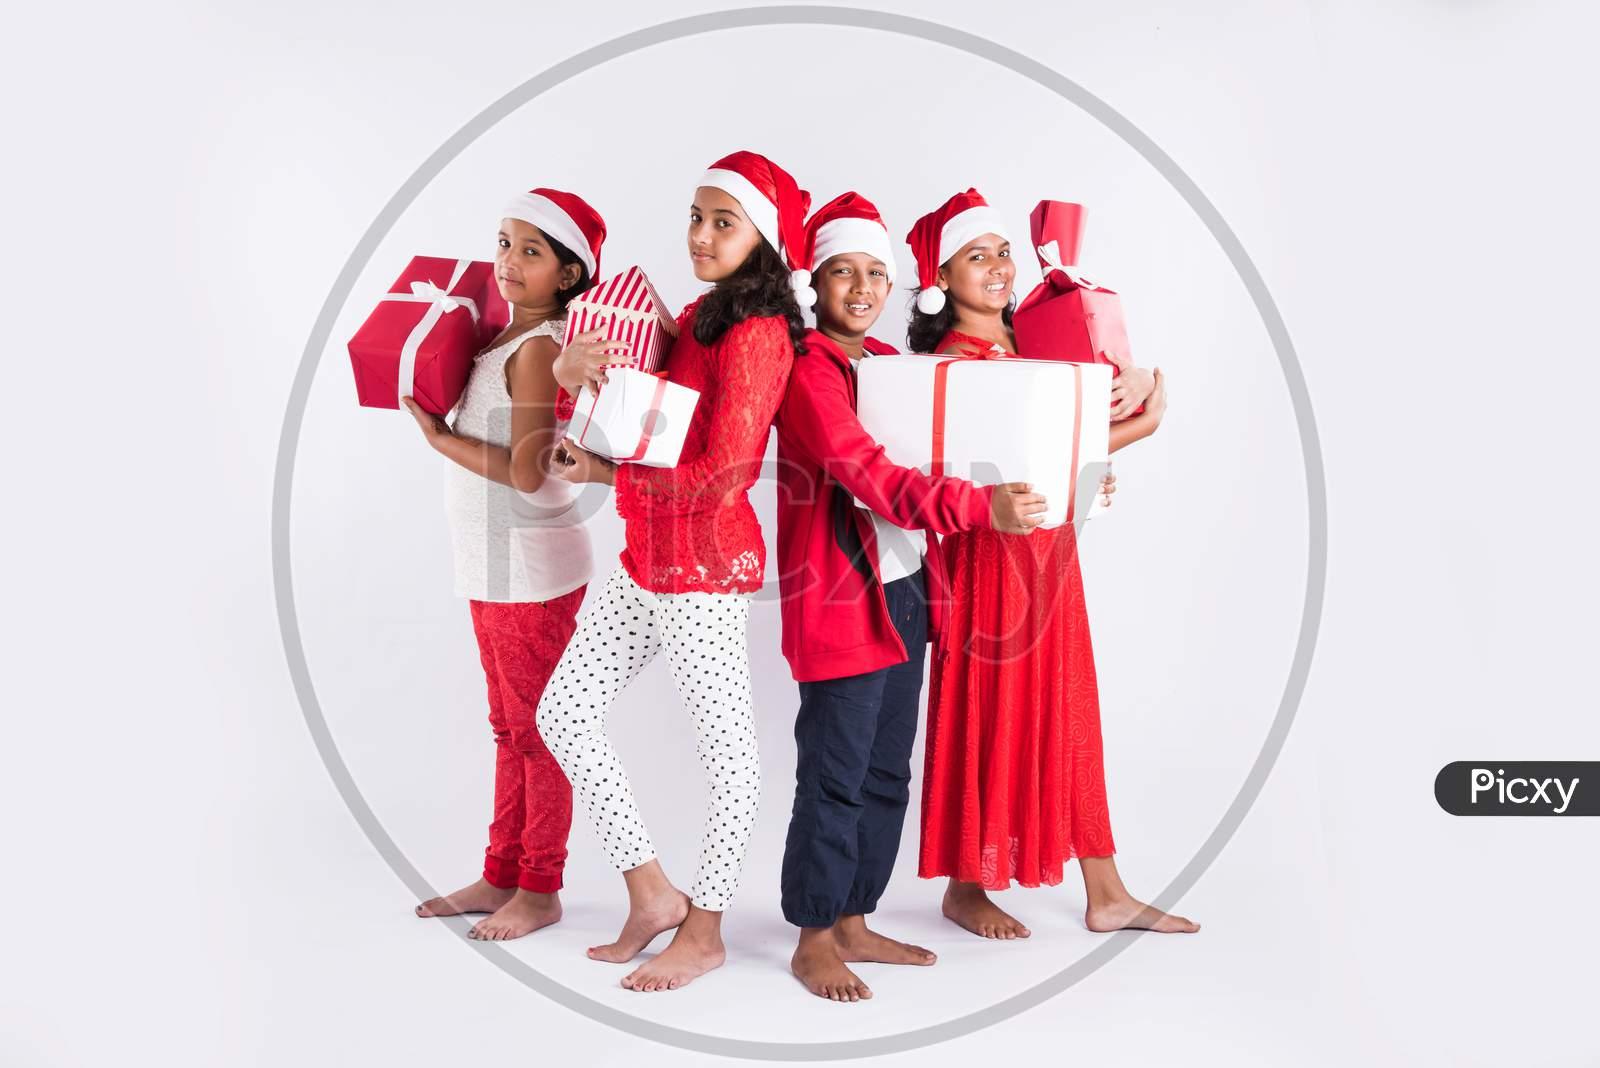 Indian Kids celebrating Christmas / X-mas